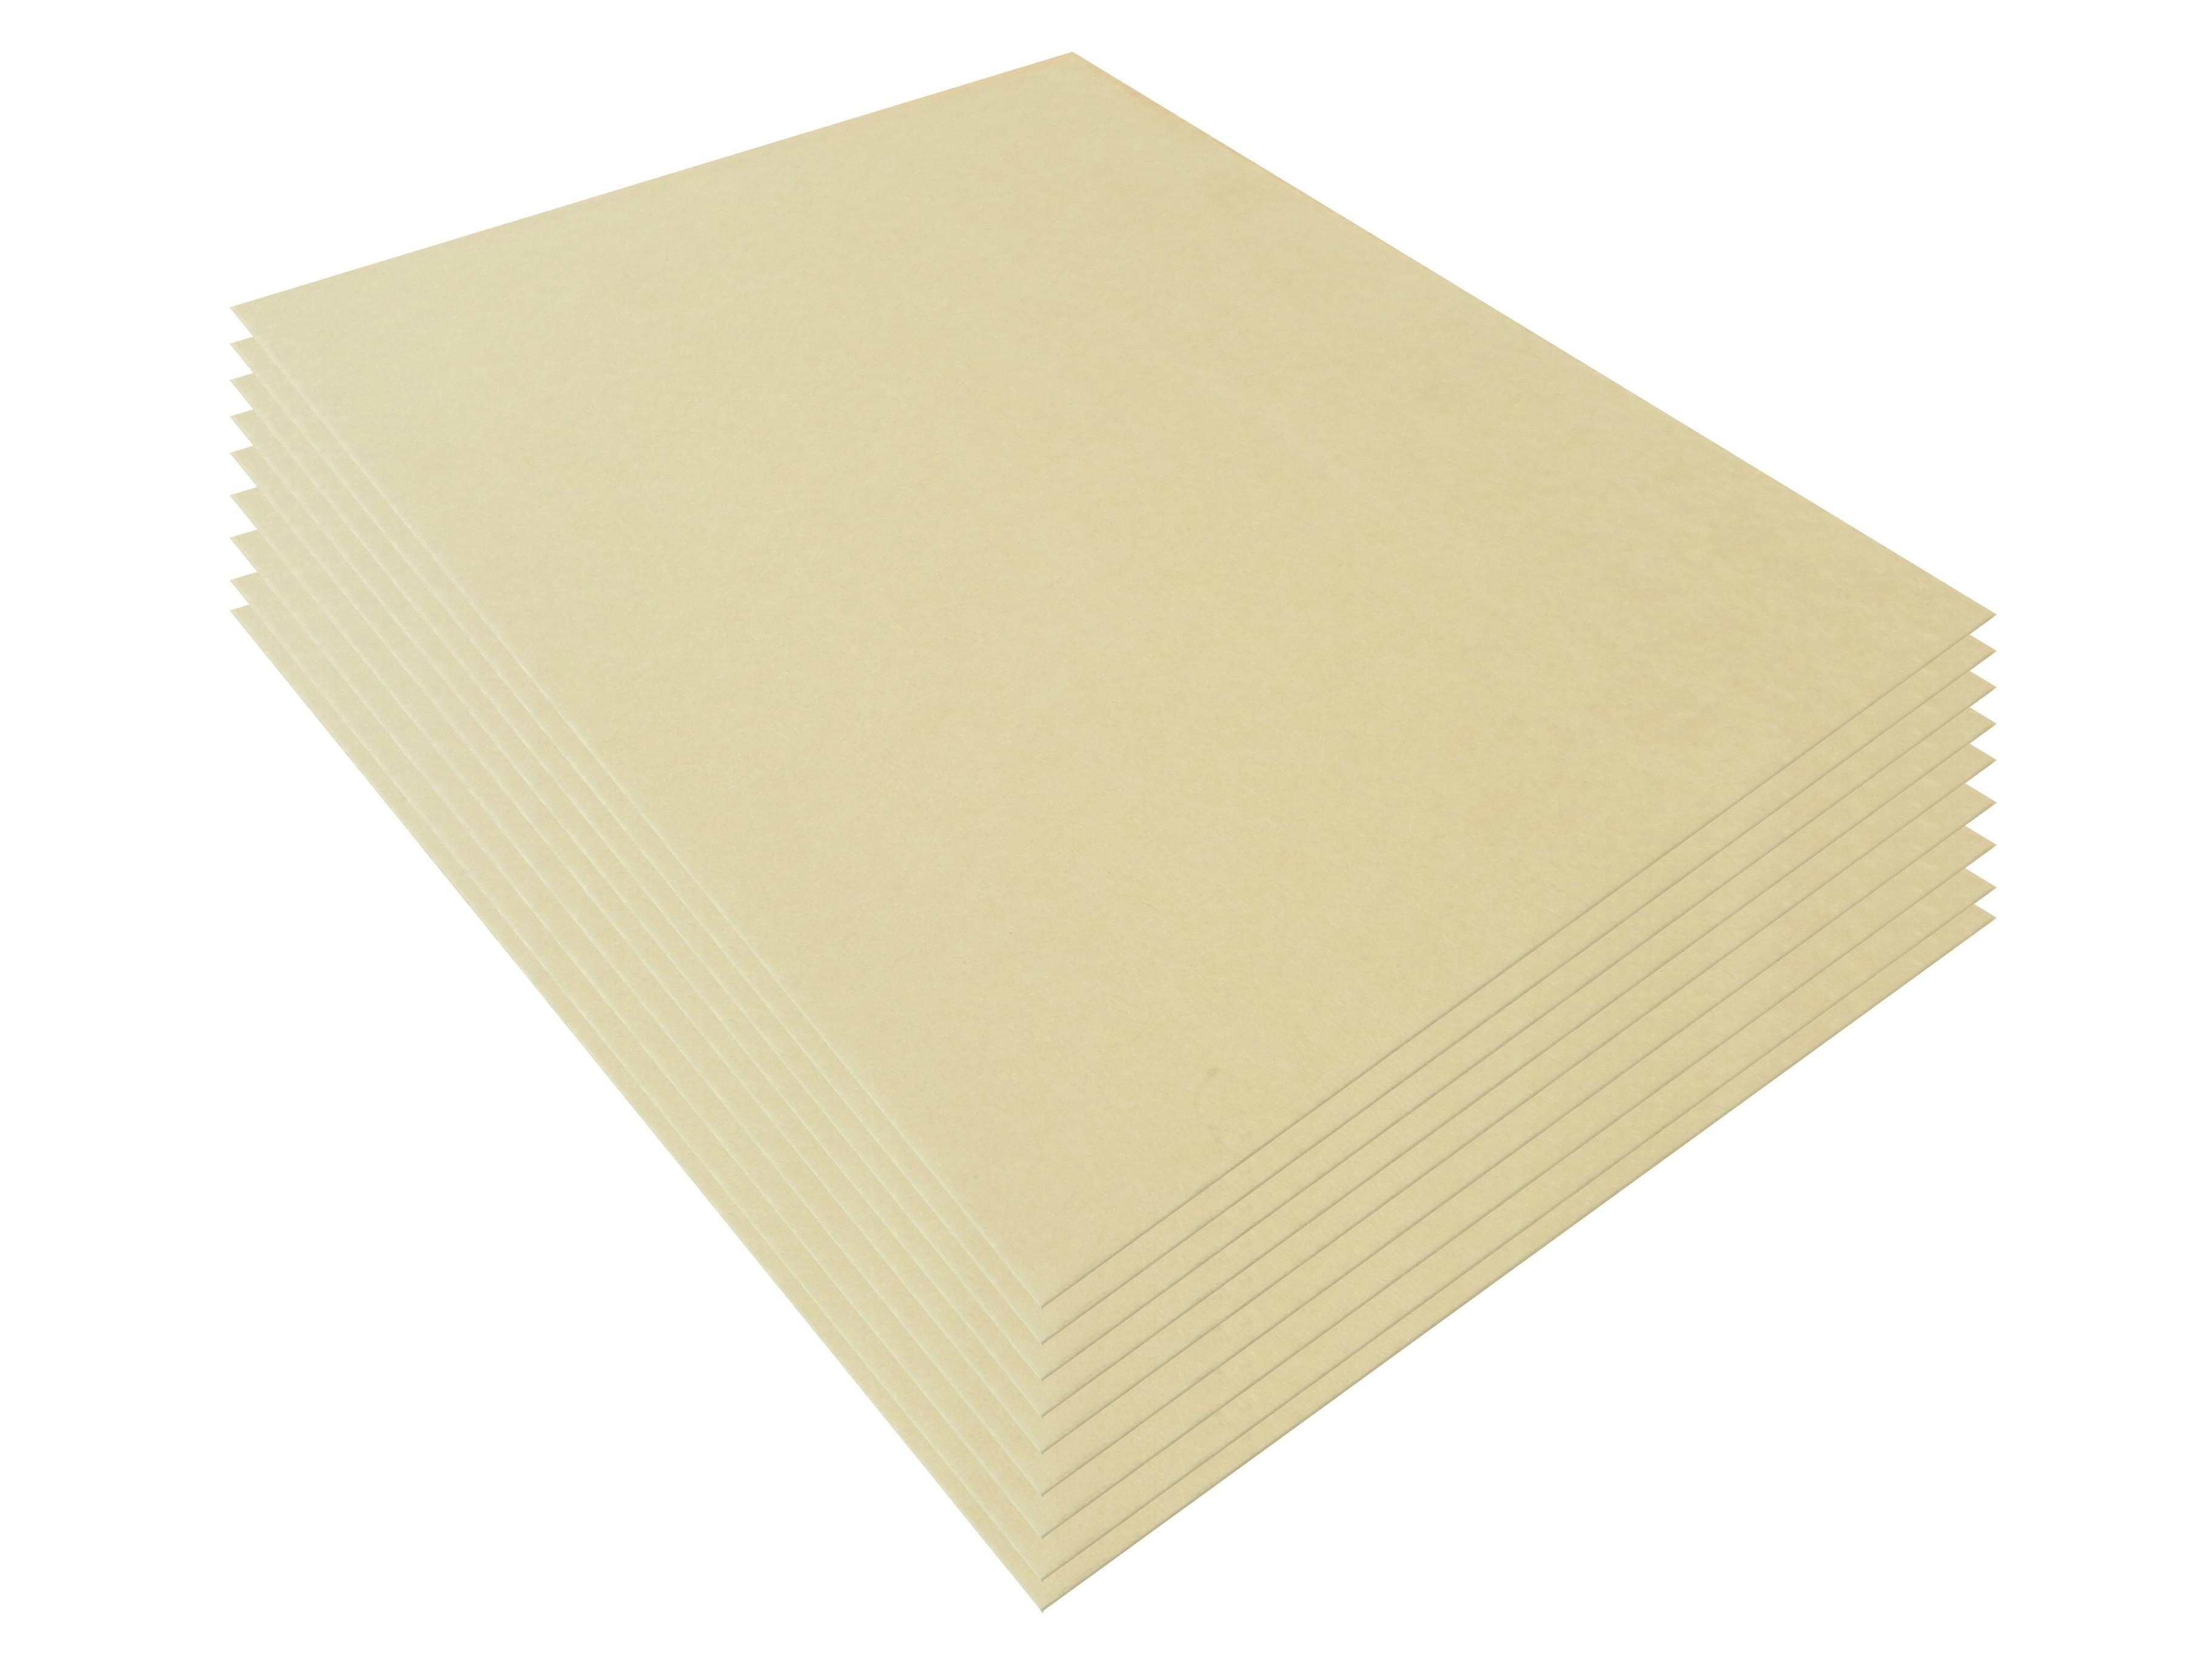 Self Adhesive Backing Board 10 pack